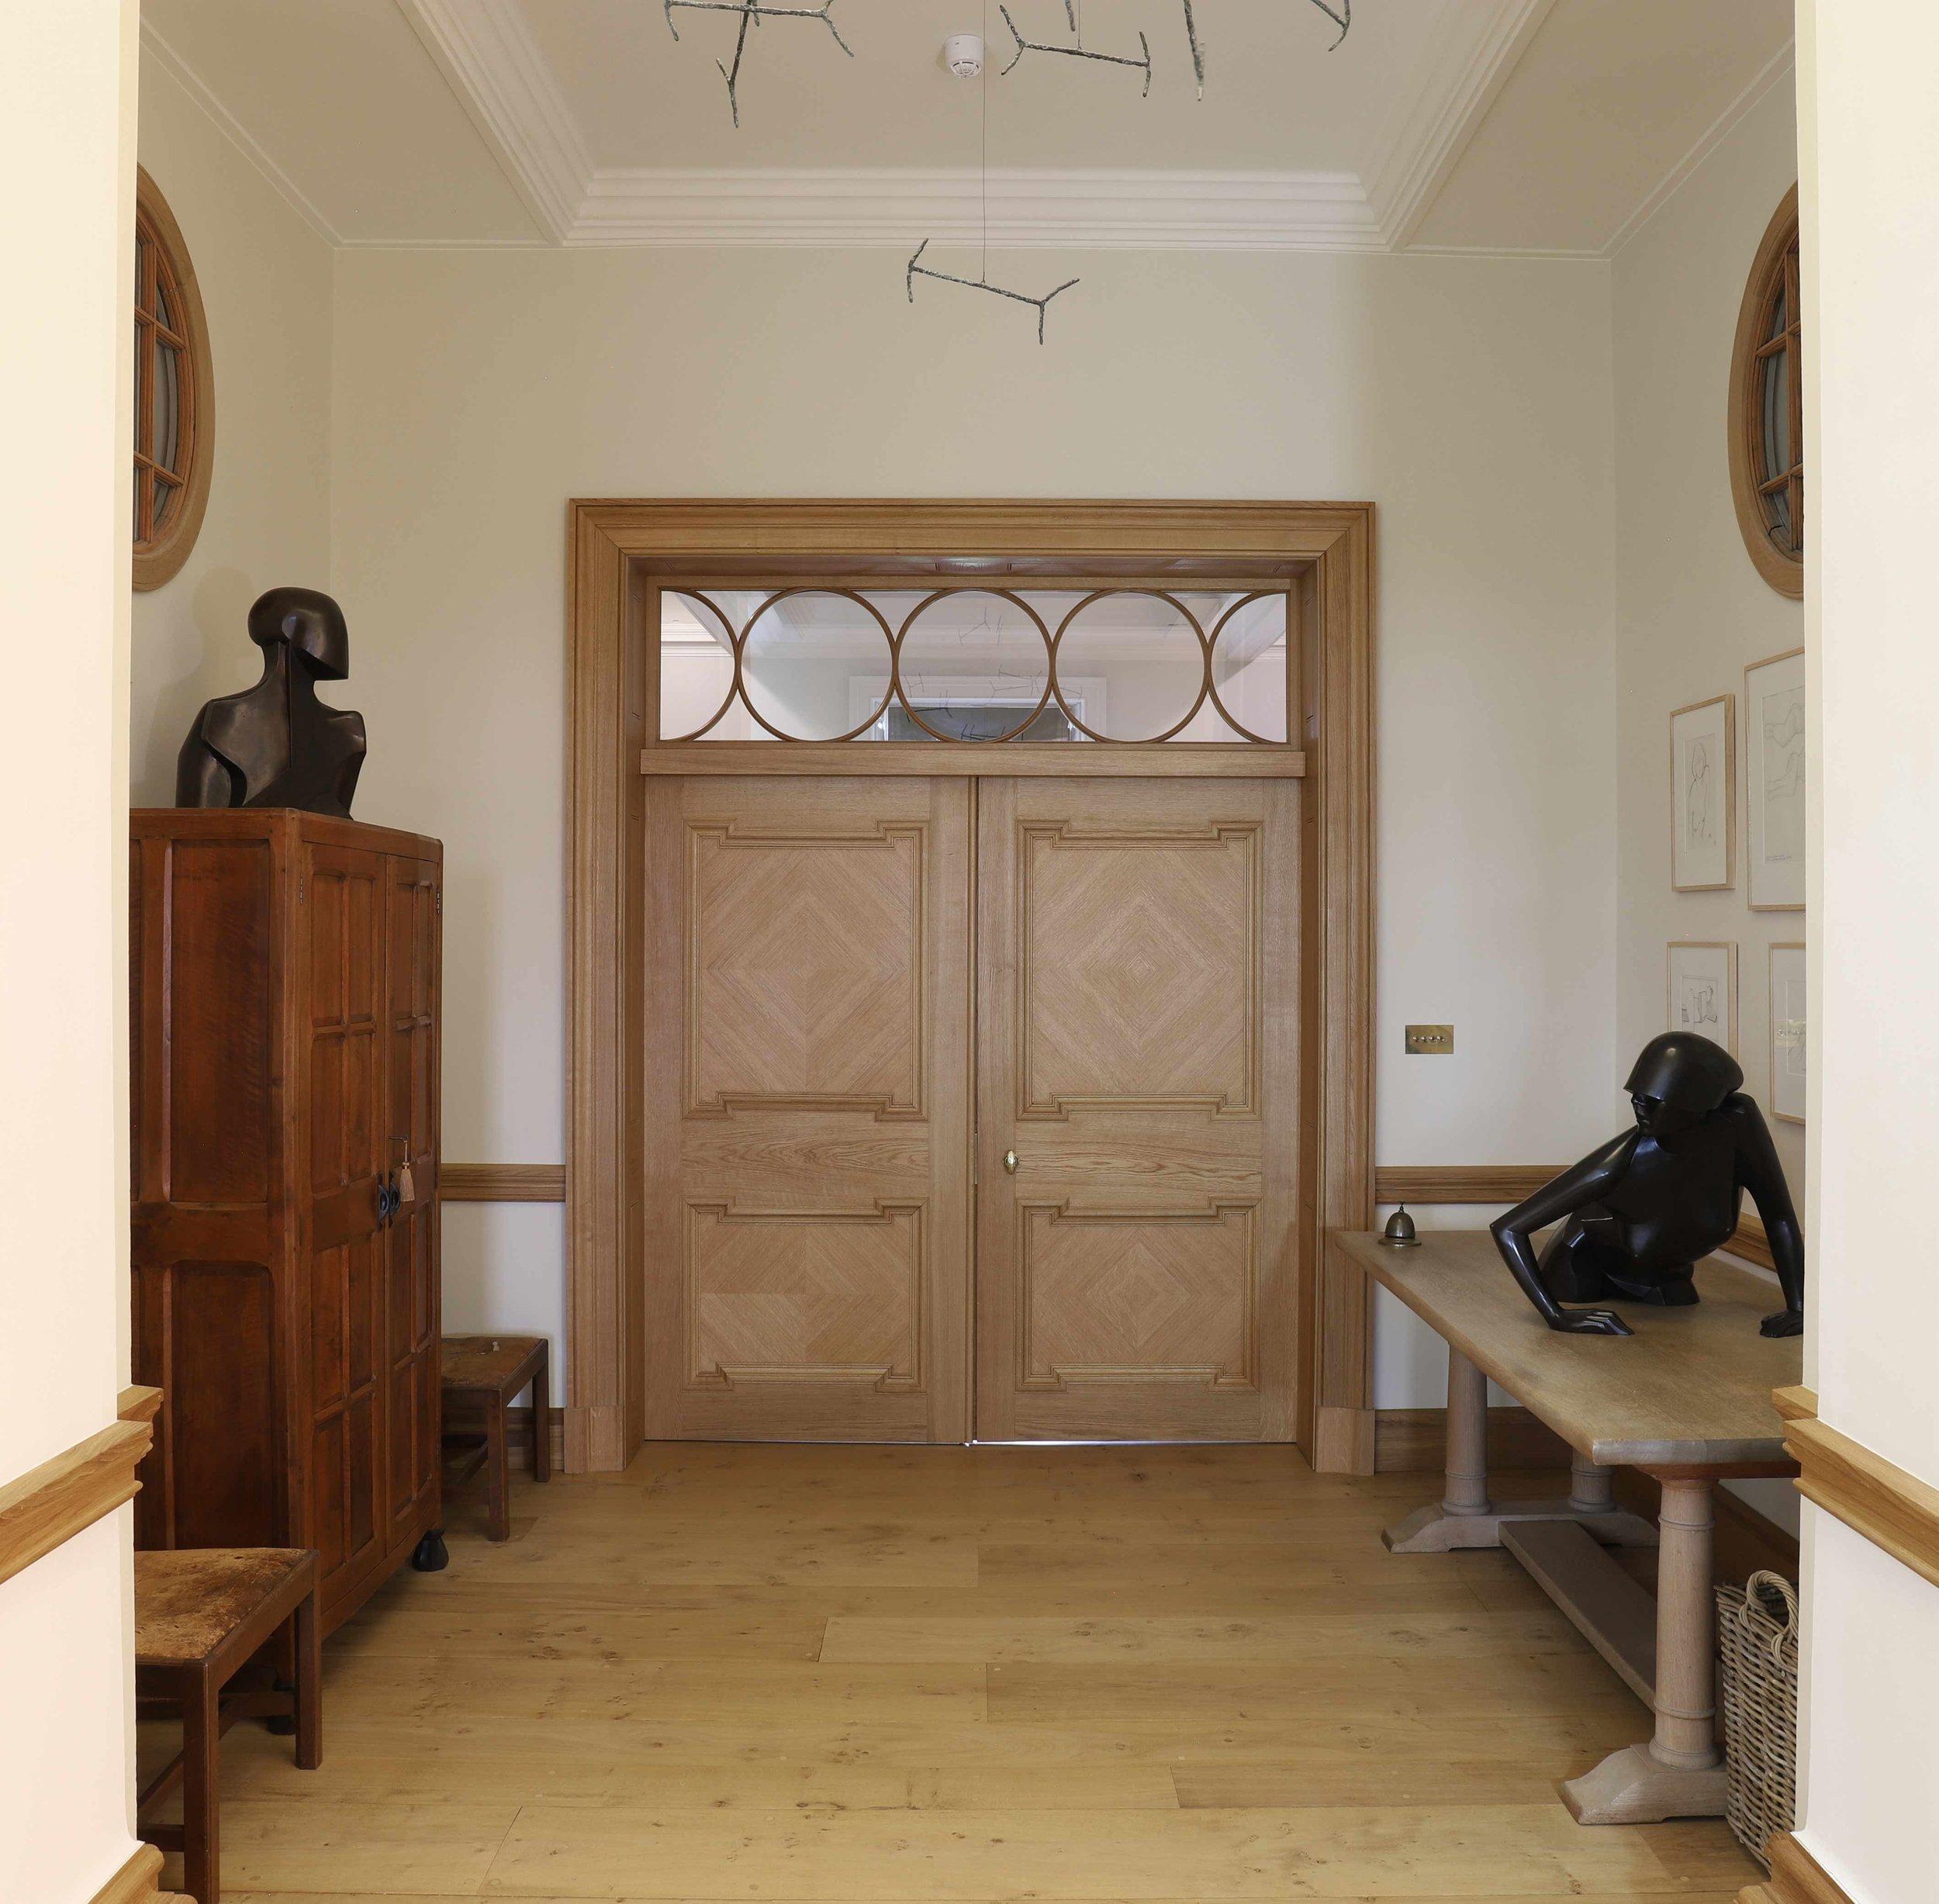 Door screen with circular astragals, Marchmont House.